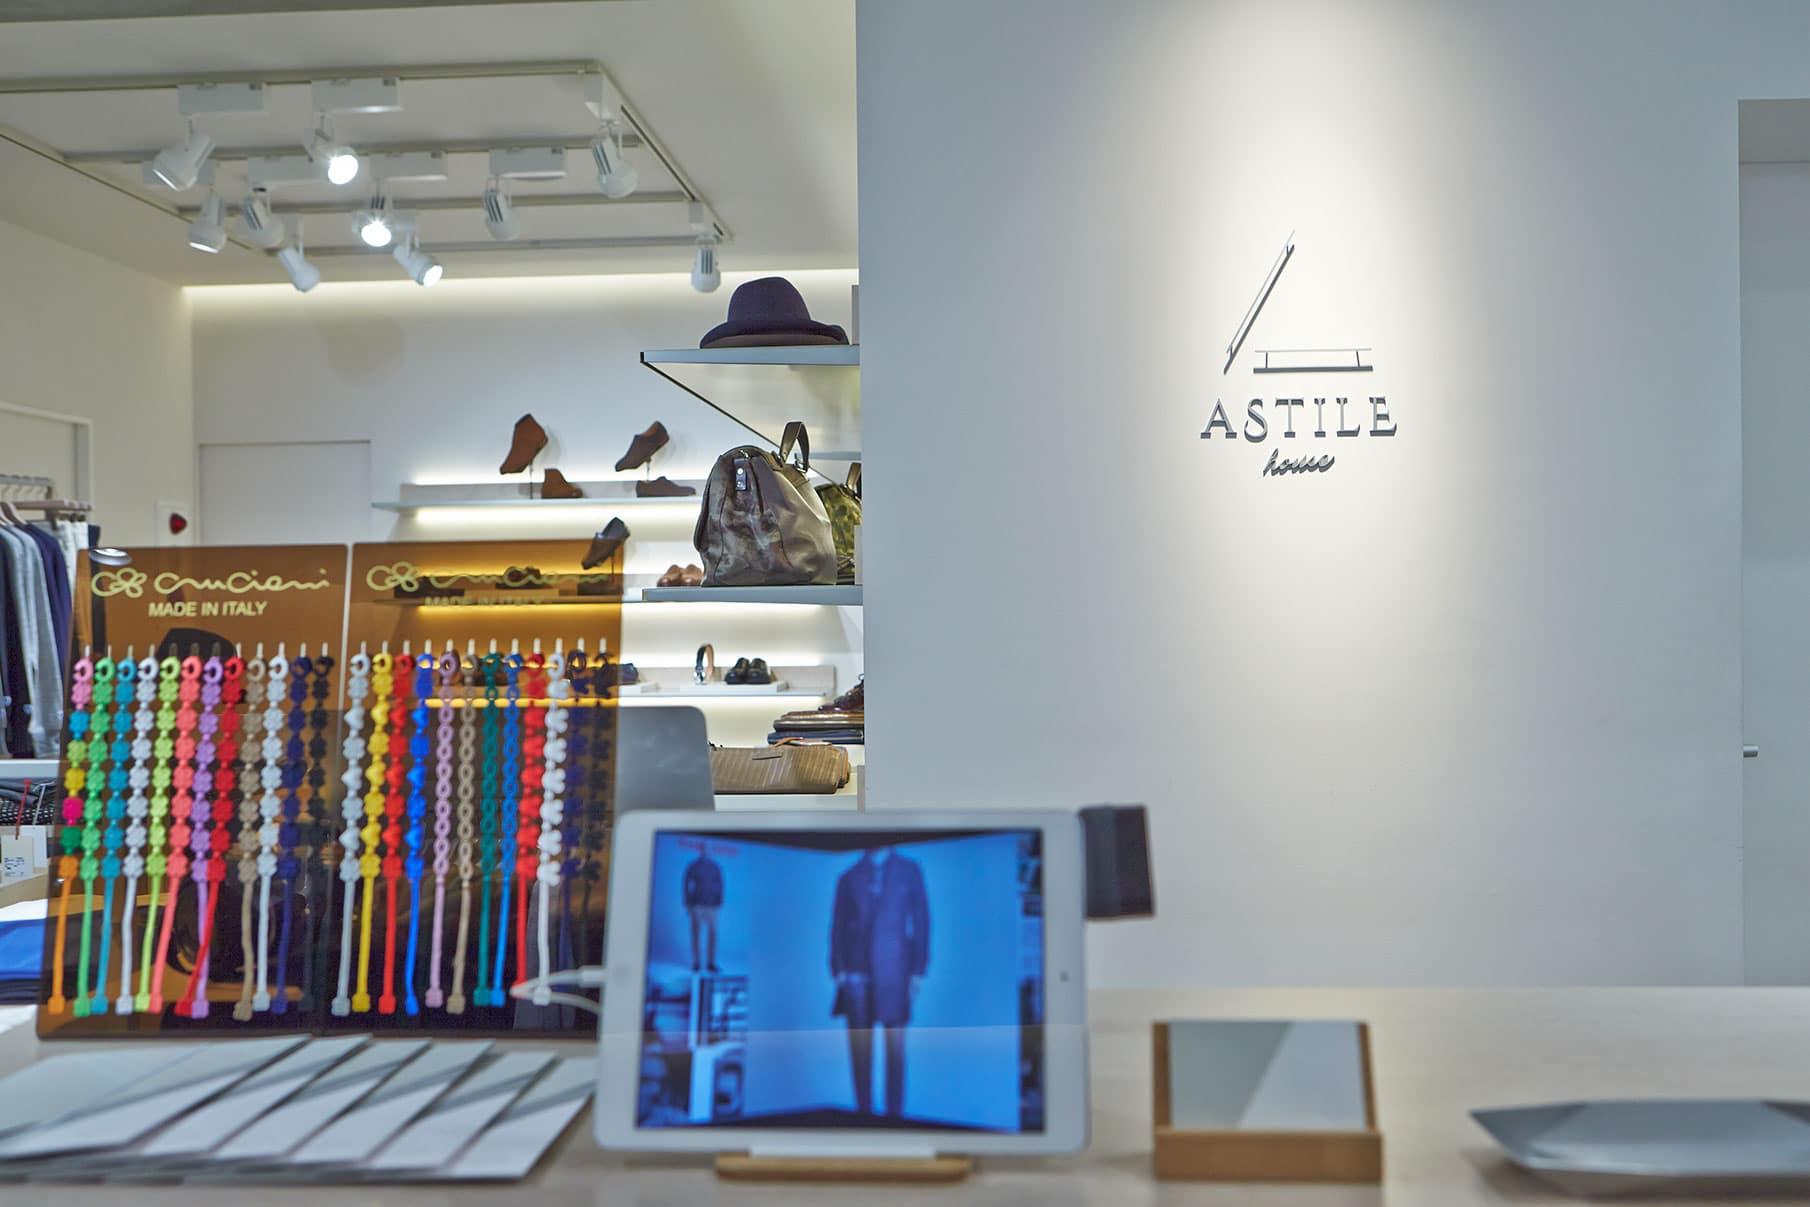 ASTILE house - Brand Identity 2